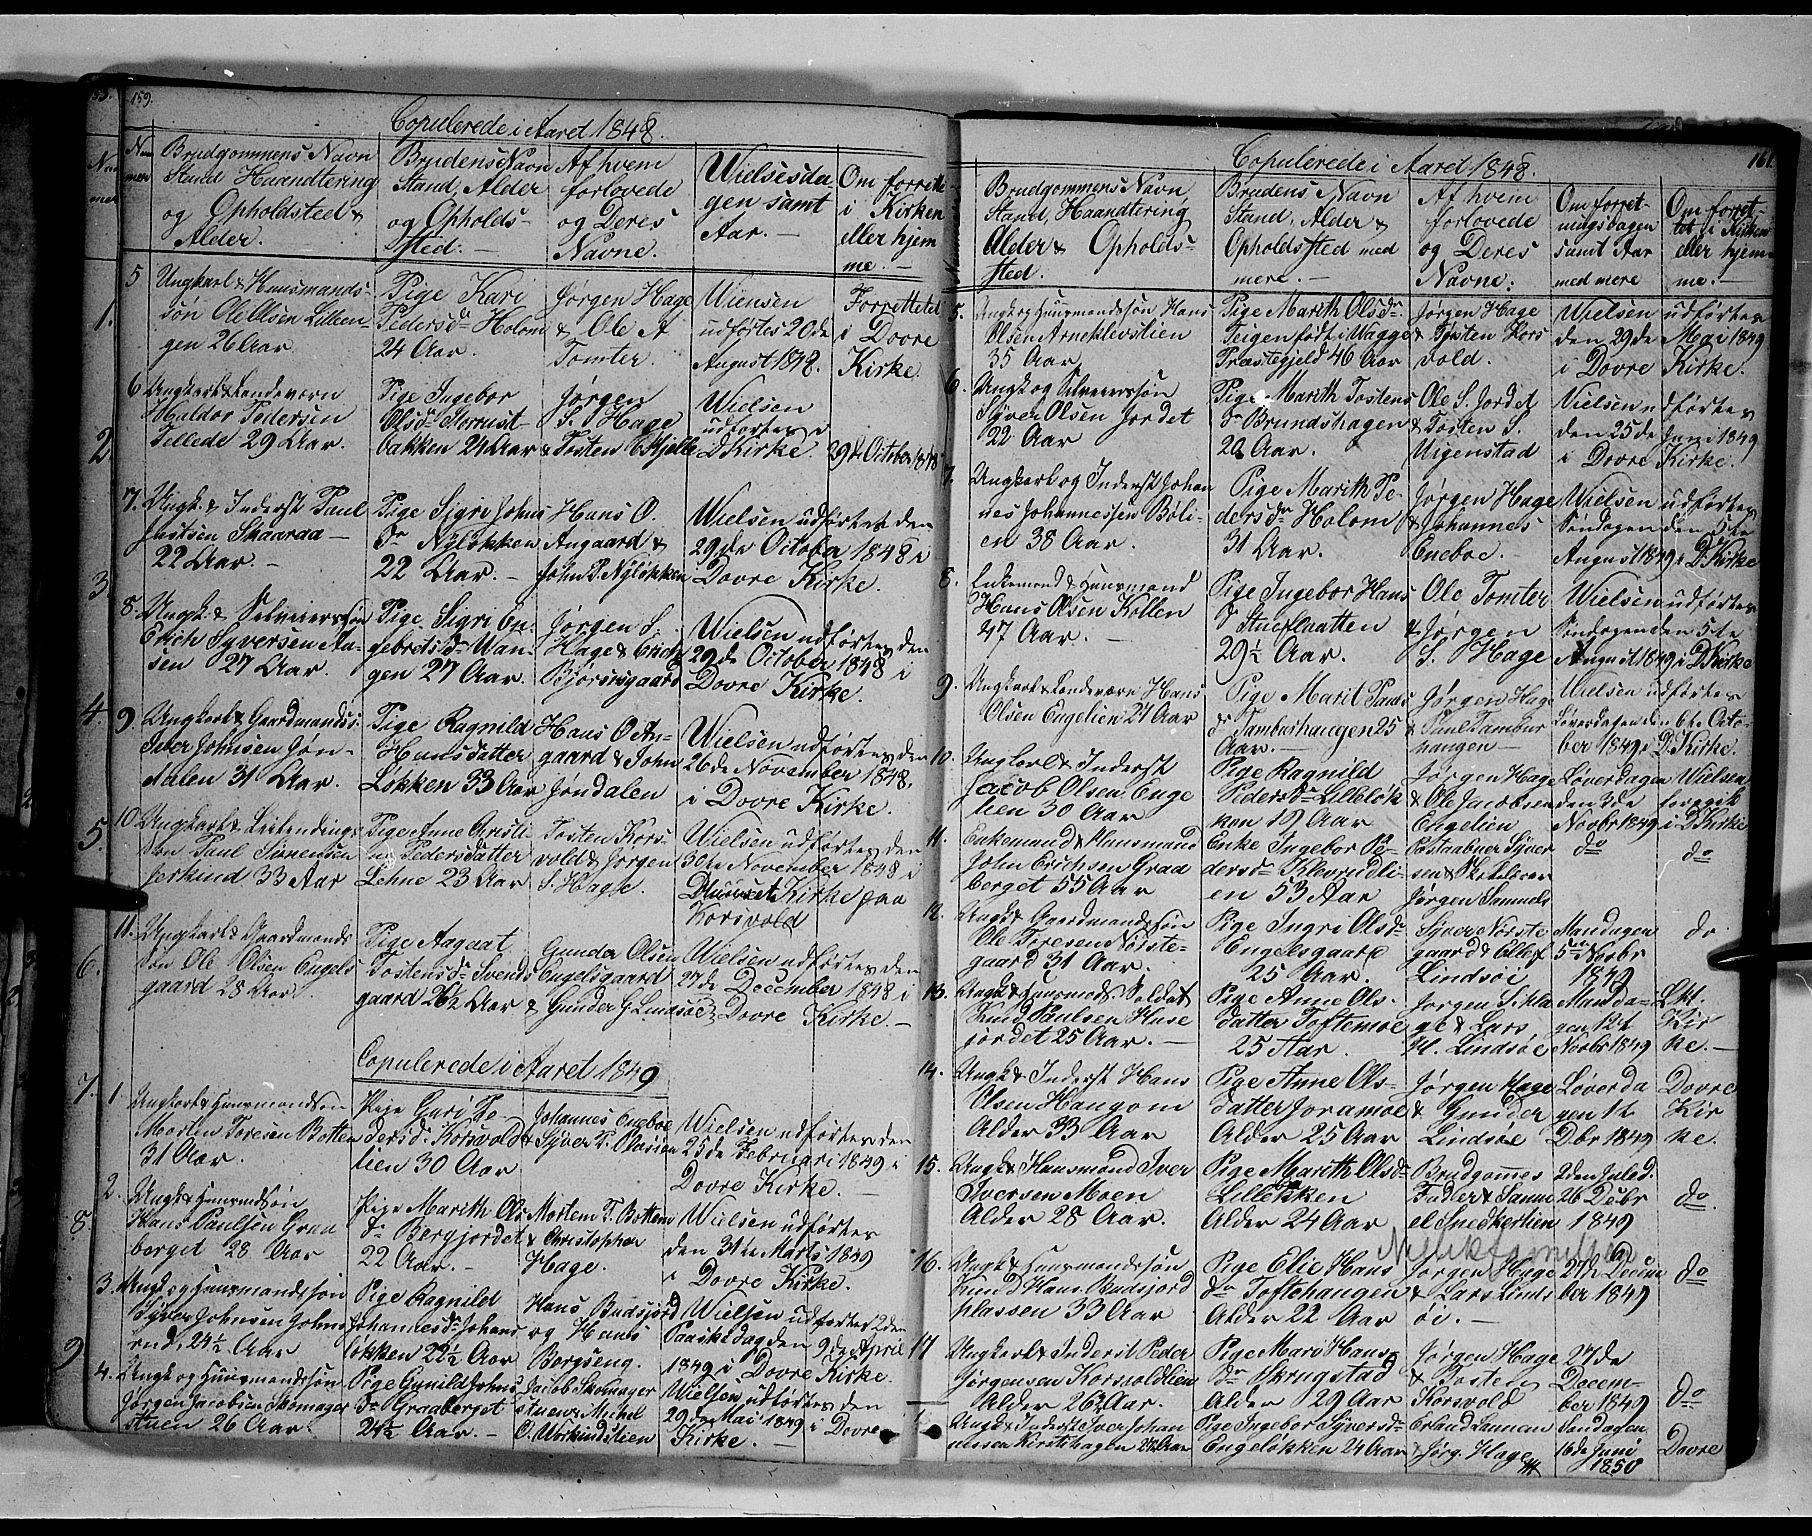 SAH, Lesja prestekontor, Klokkerbok nr. 3, 1842-1862, s. 159-160